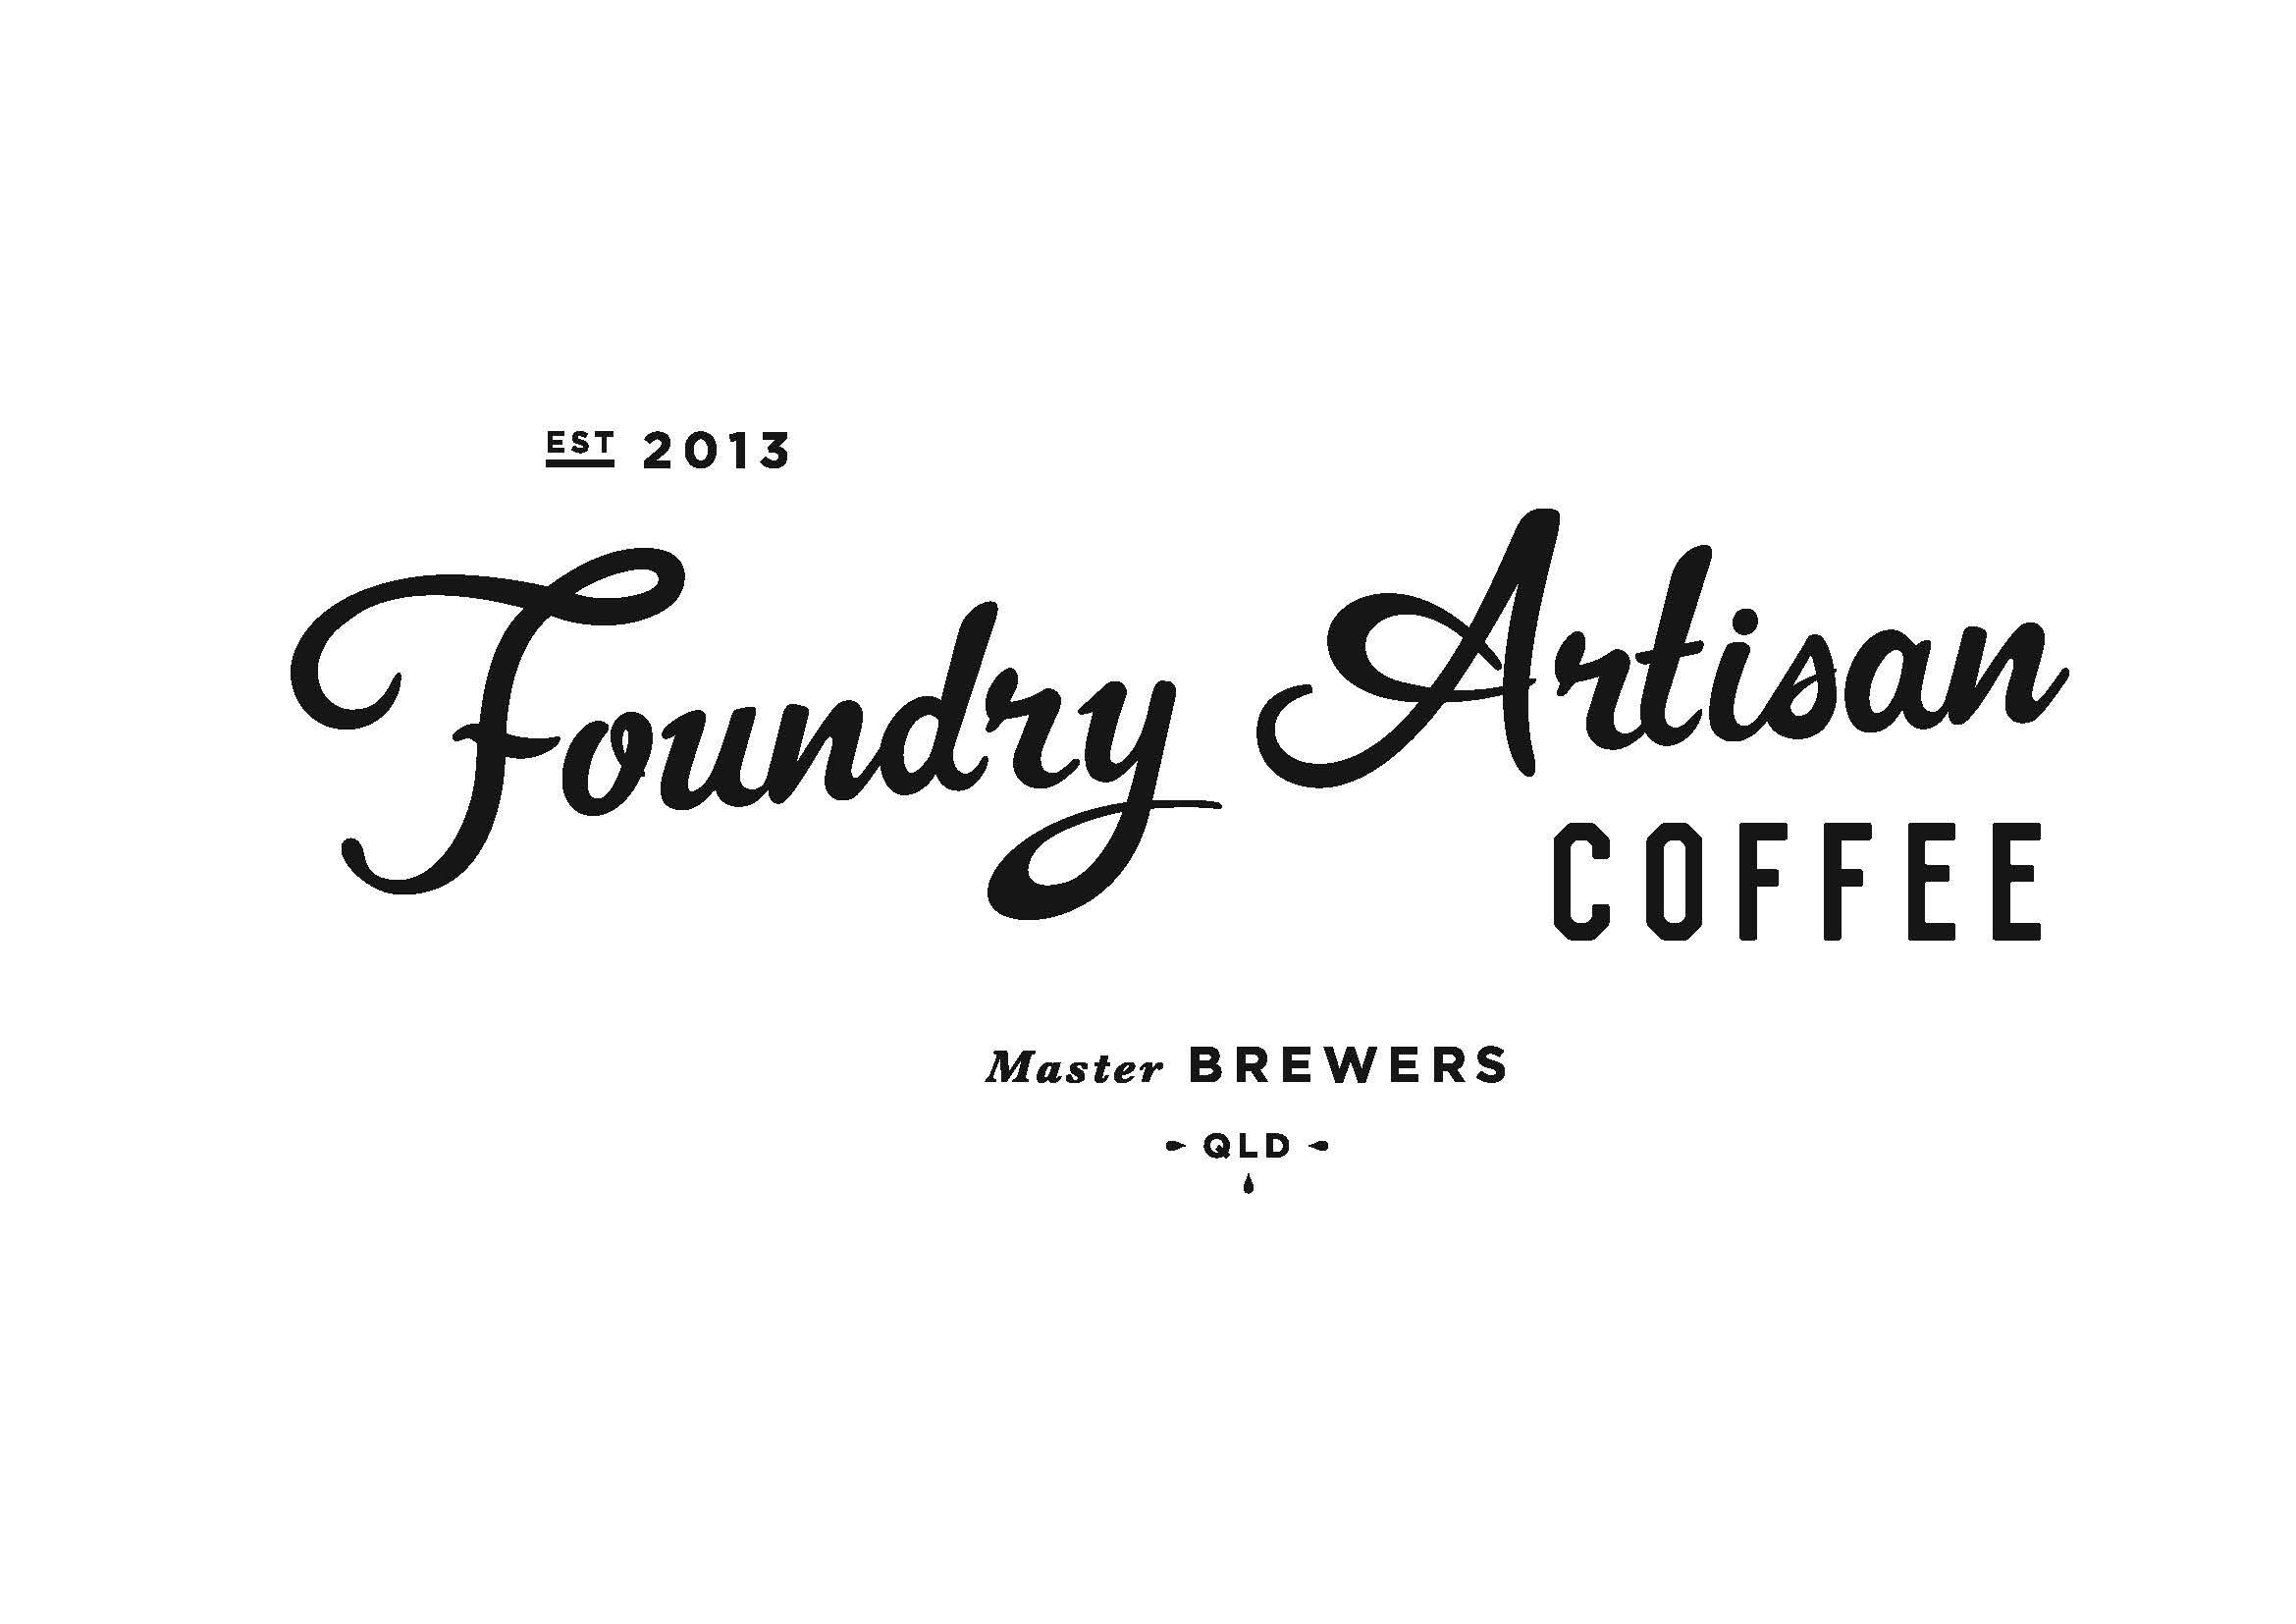 Foundry Artisan Coffee